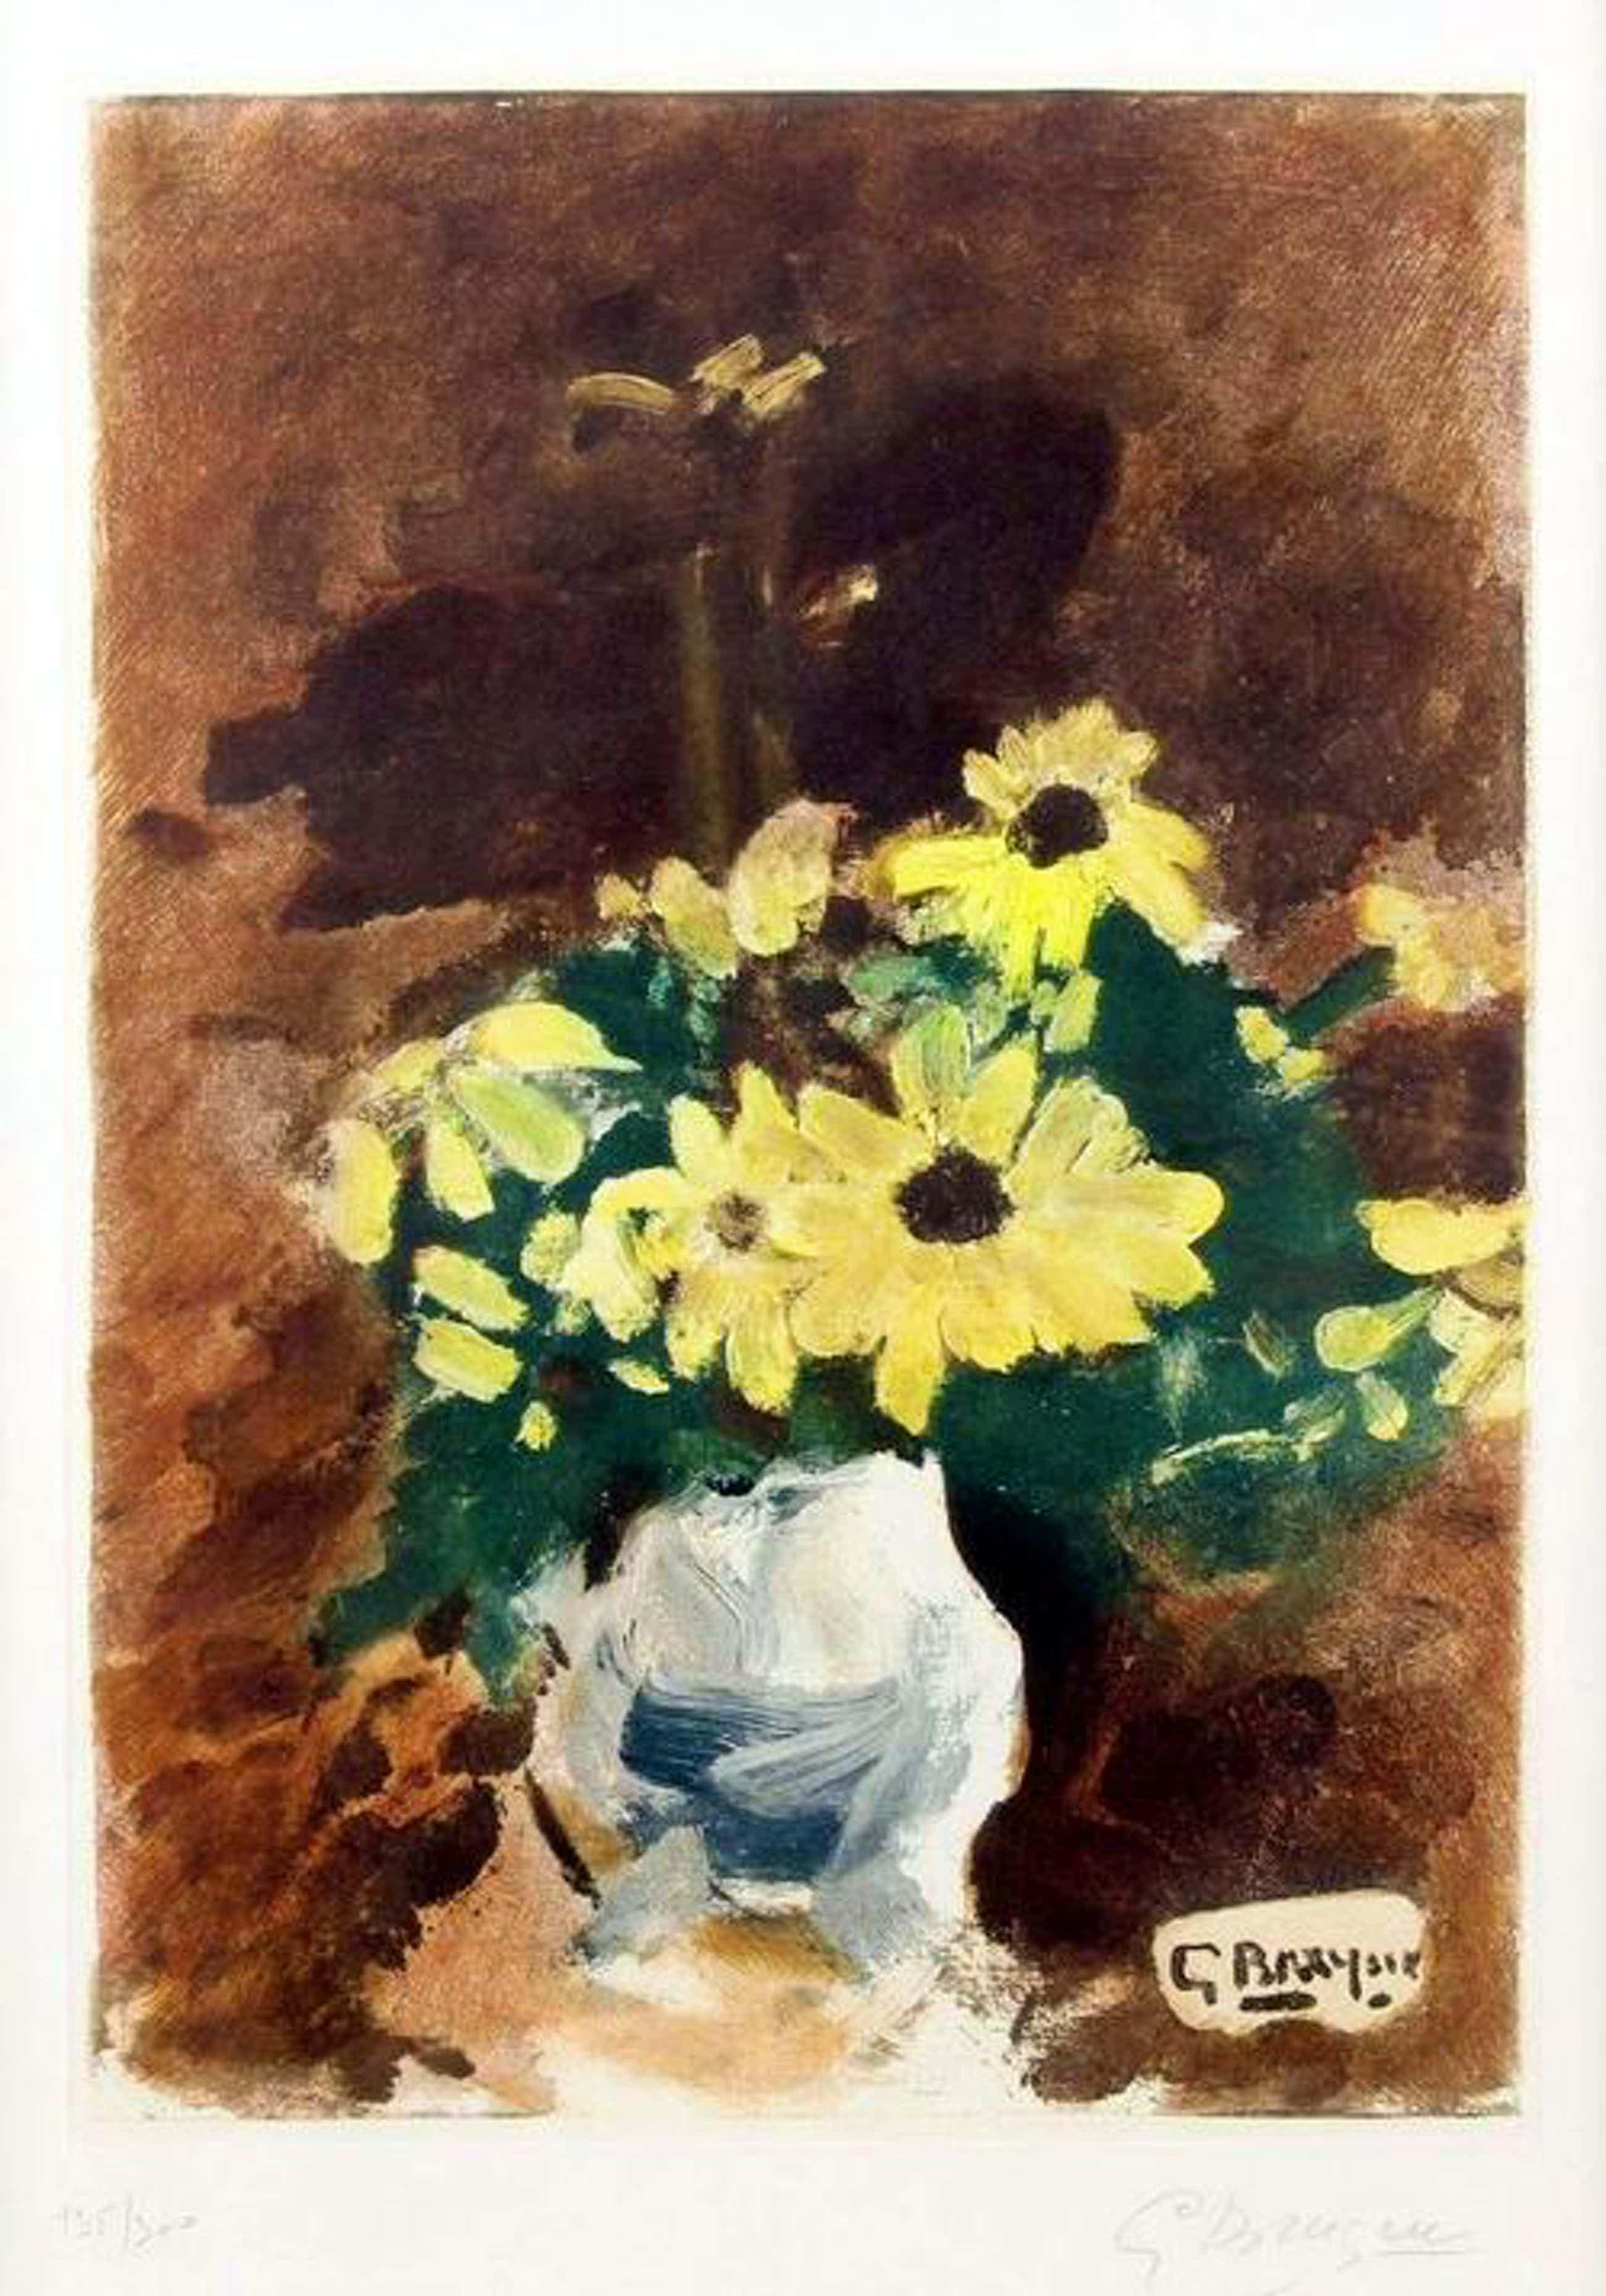 Georges Braque - Farbaquatinta, Vase de fleur jaunes, 1955 kopen? Bied vanaf 1900!